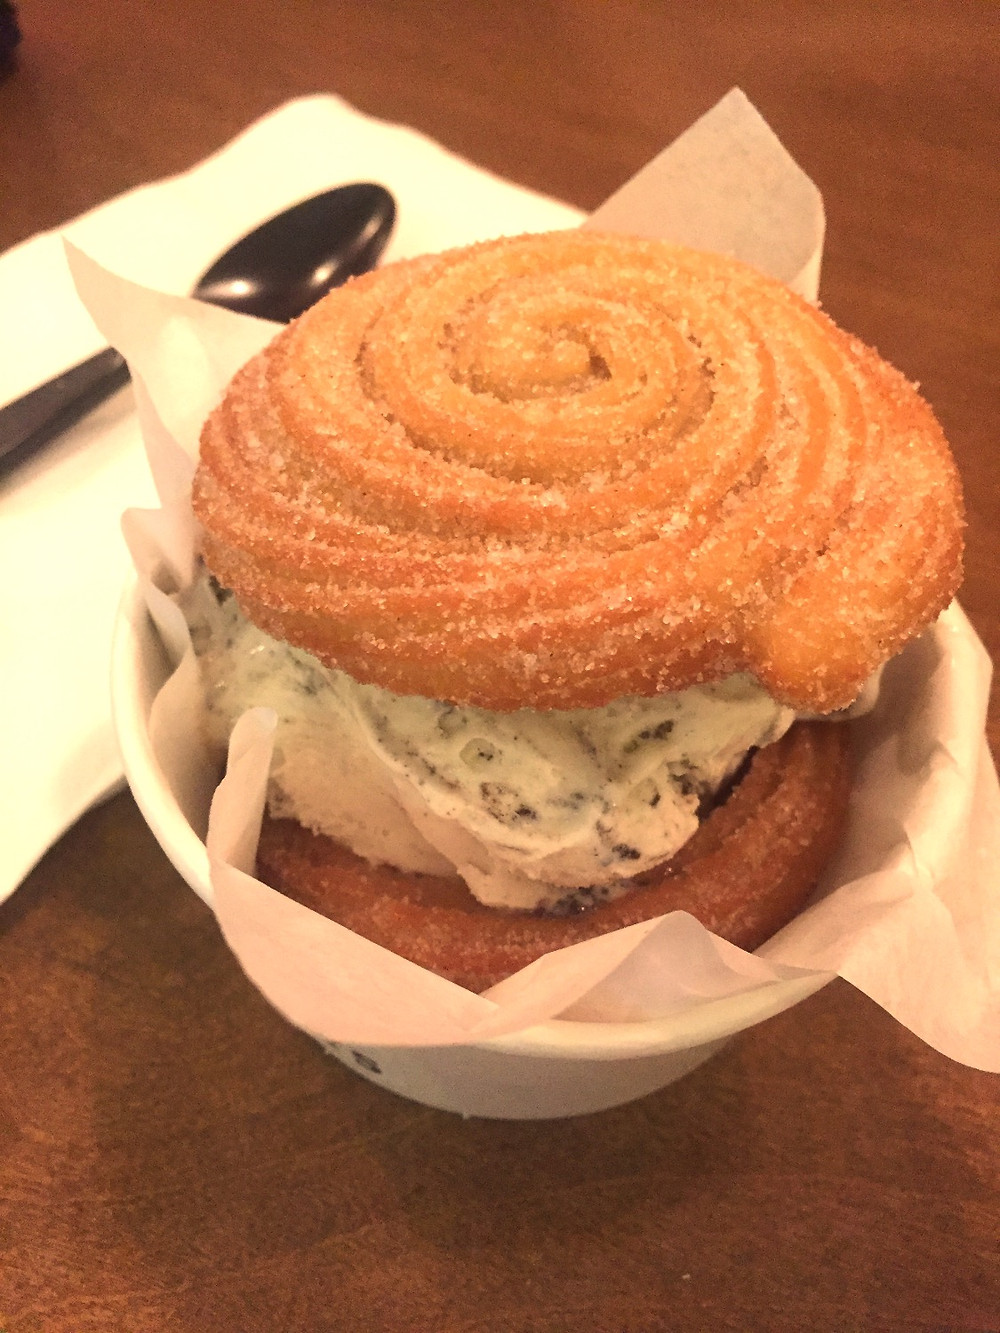 Churro Ice Cream Sandwich at Happy Days Cafe